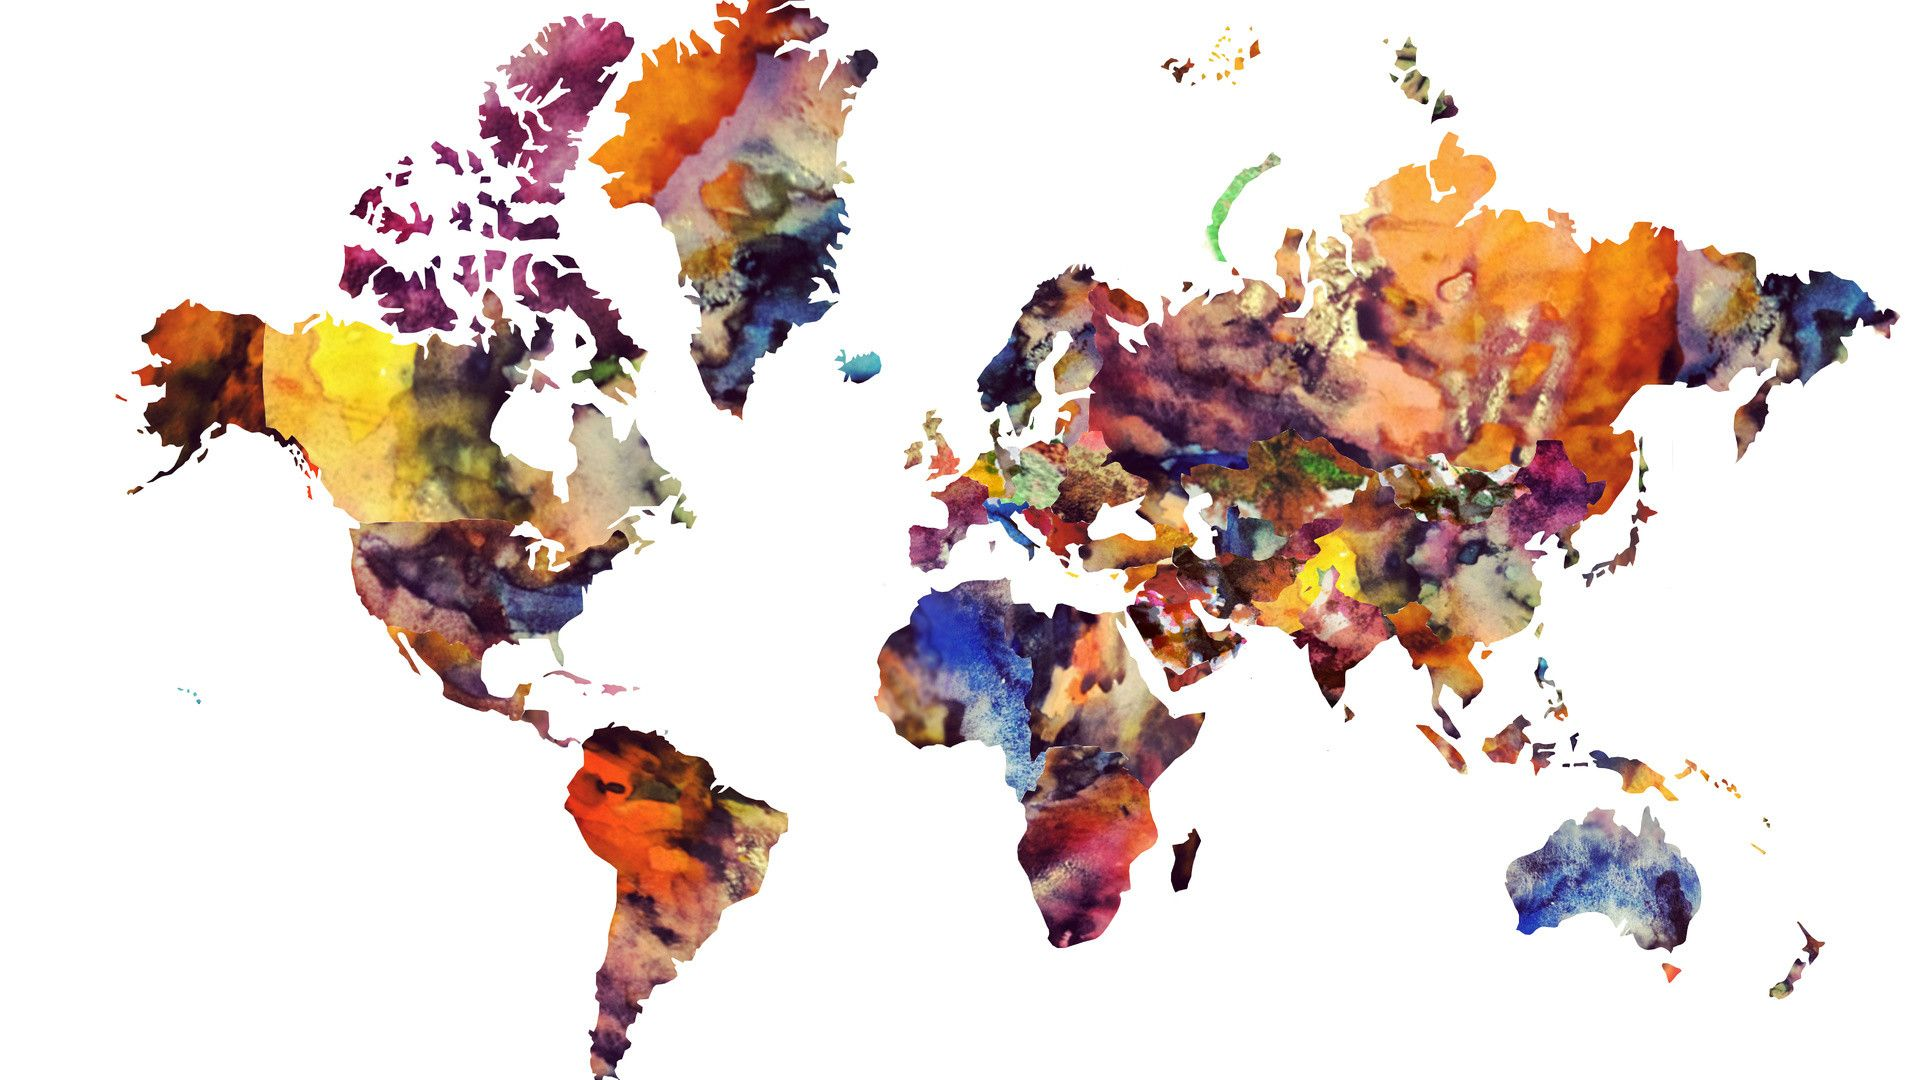 1920 X 1080 7 Mundo Mapa Desktop Wallpaper7 1 600x338 Water Color World Map World Map Art World Map Wallpaper